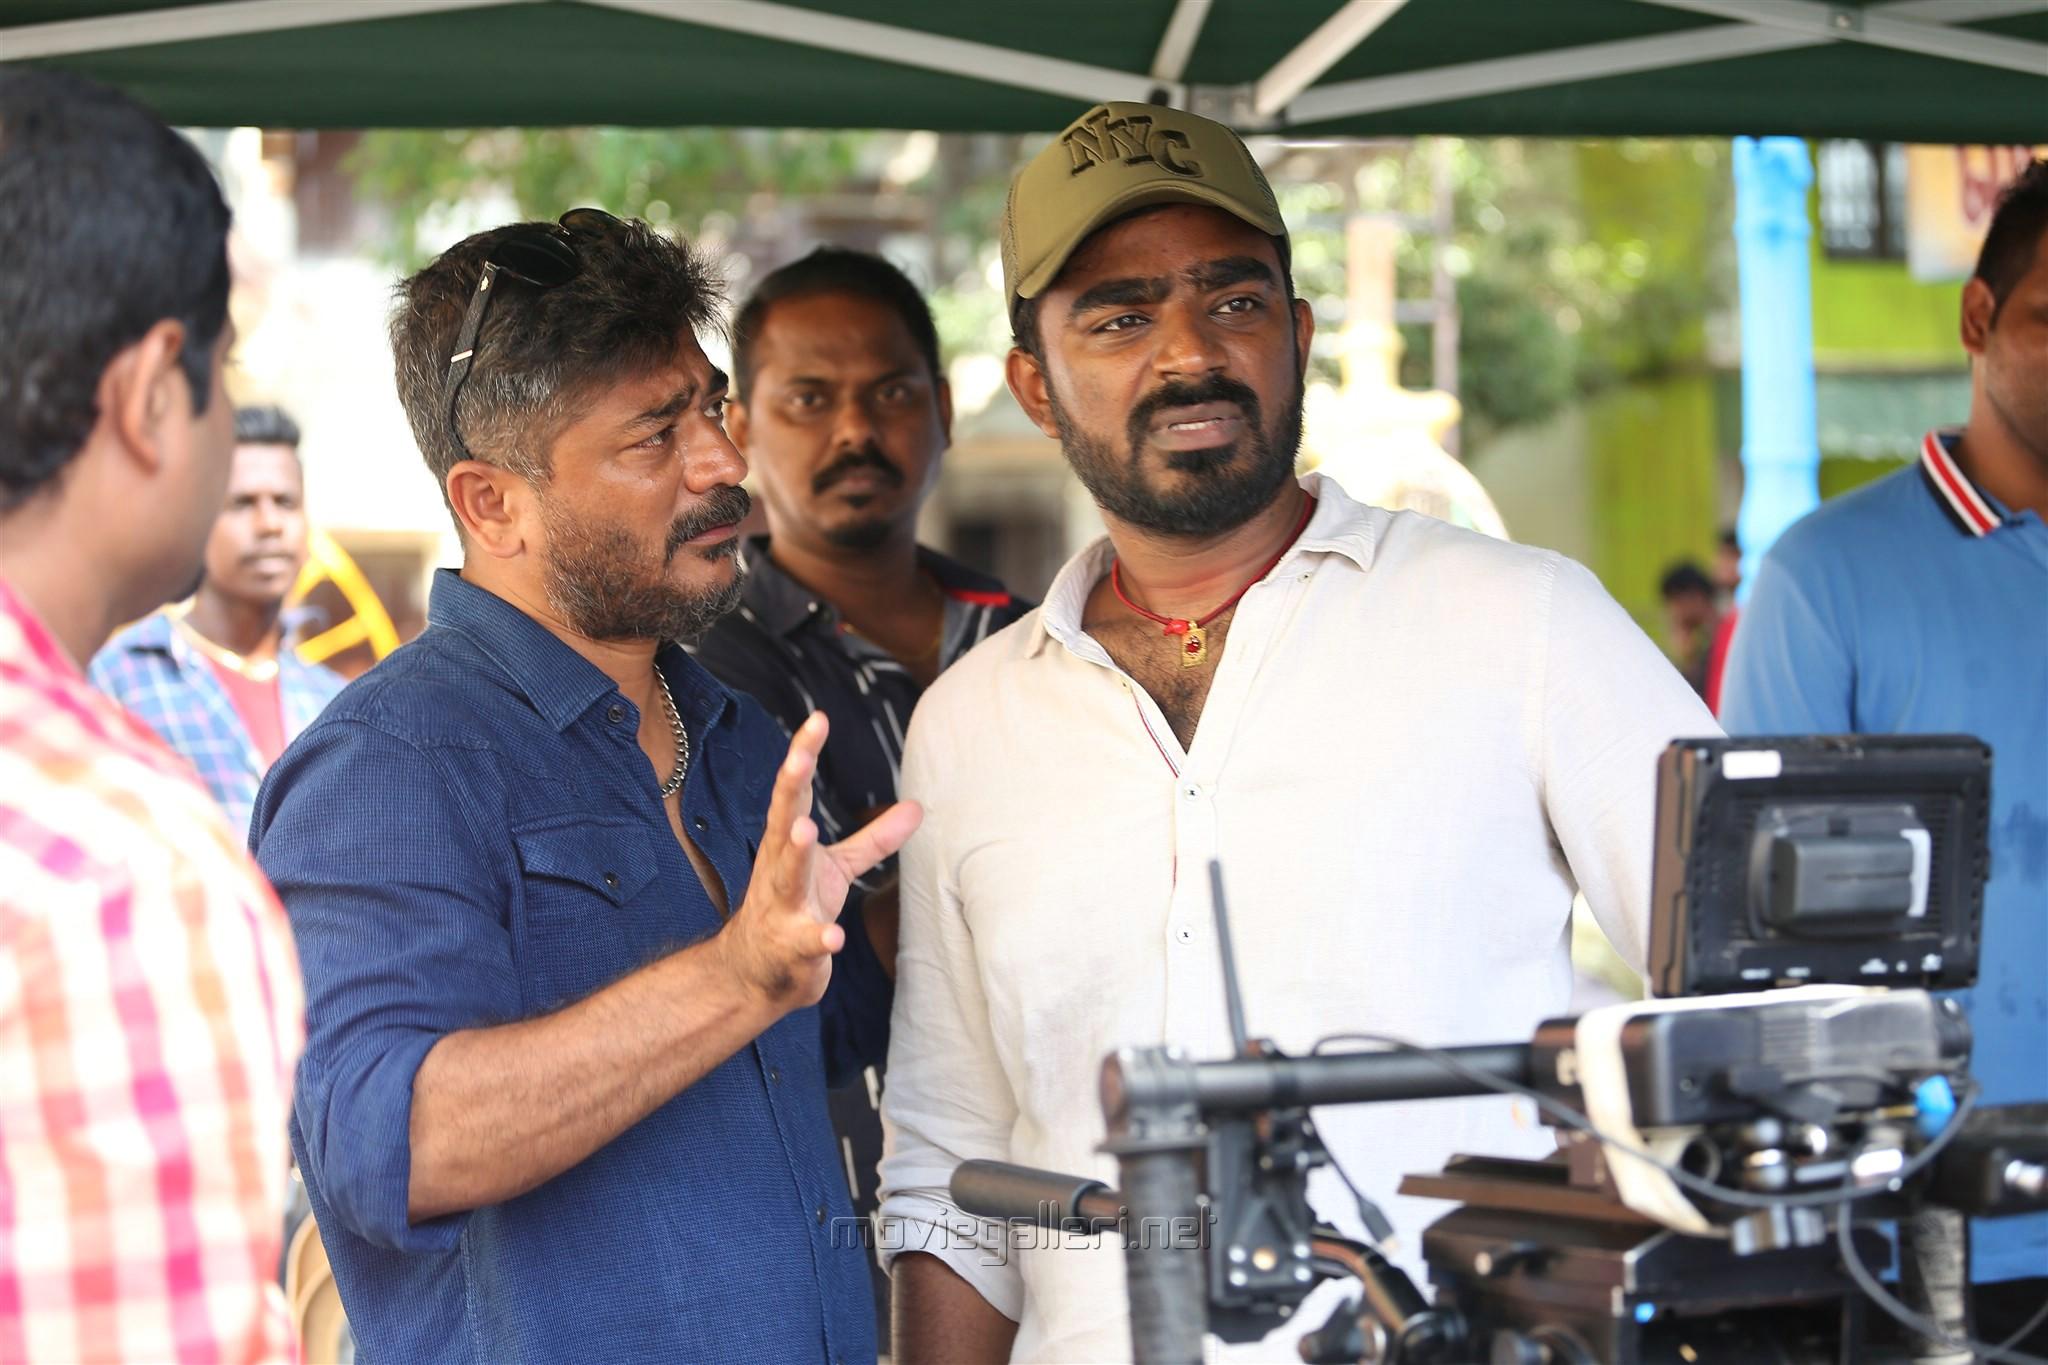 Dance Master Raju Sundaram Cinematographer Abinandhan Ramanujam Sakka Podu Podu Raja Song Shooting Images